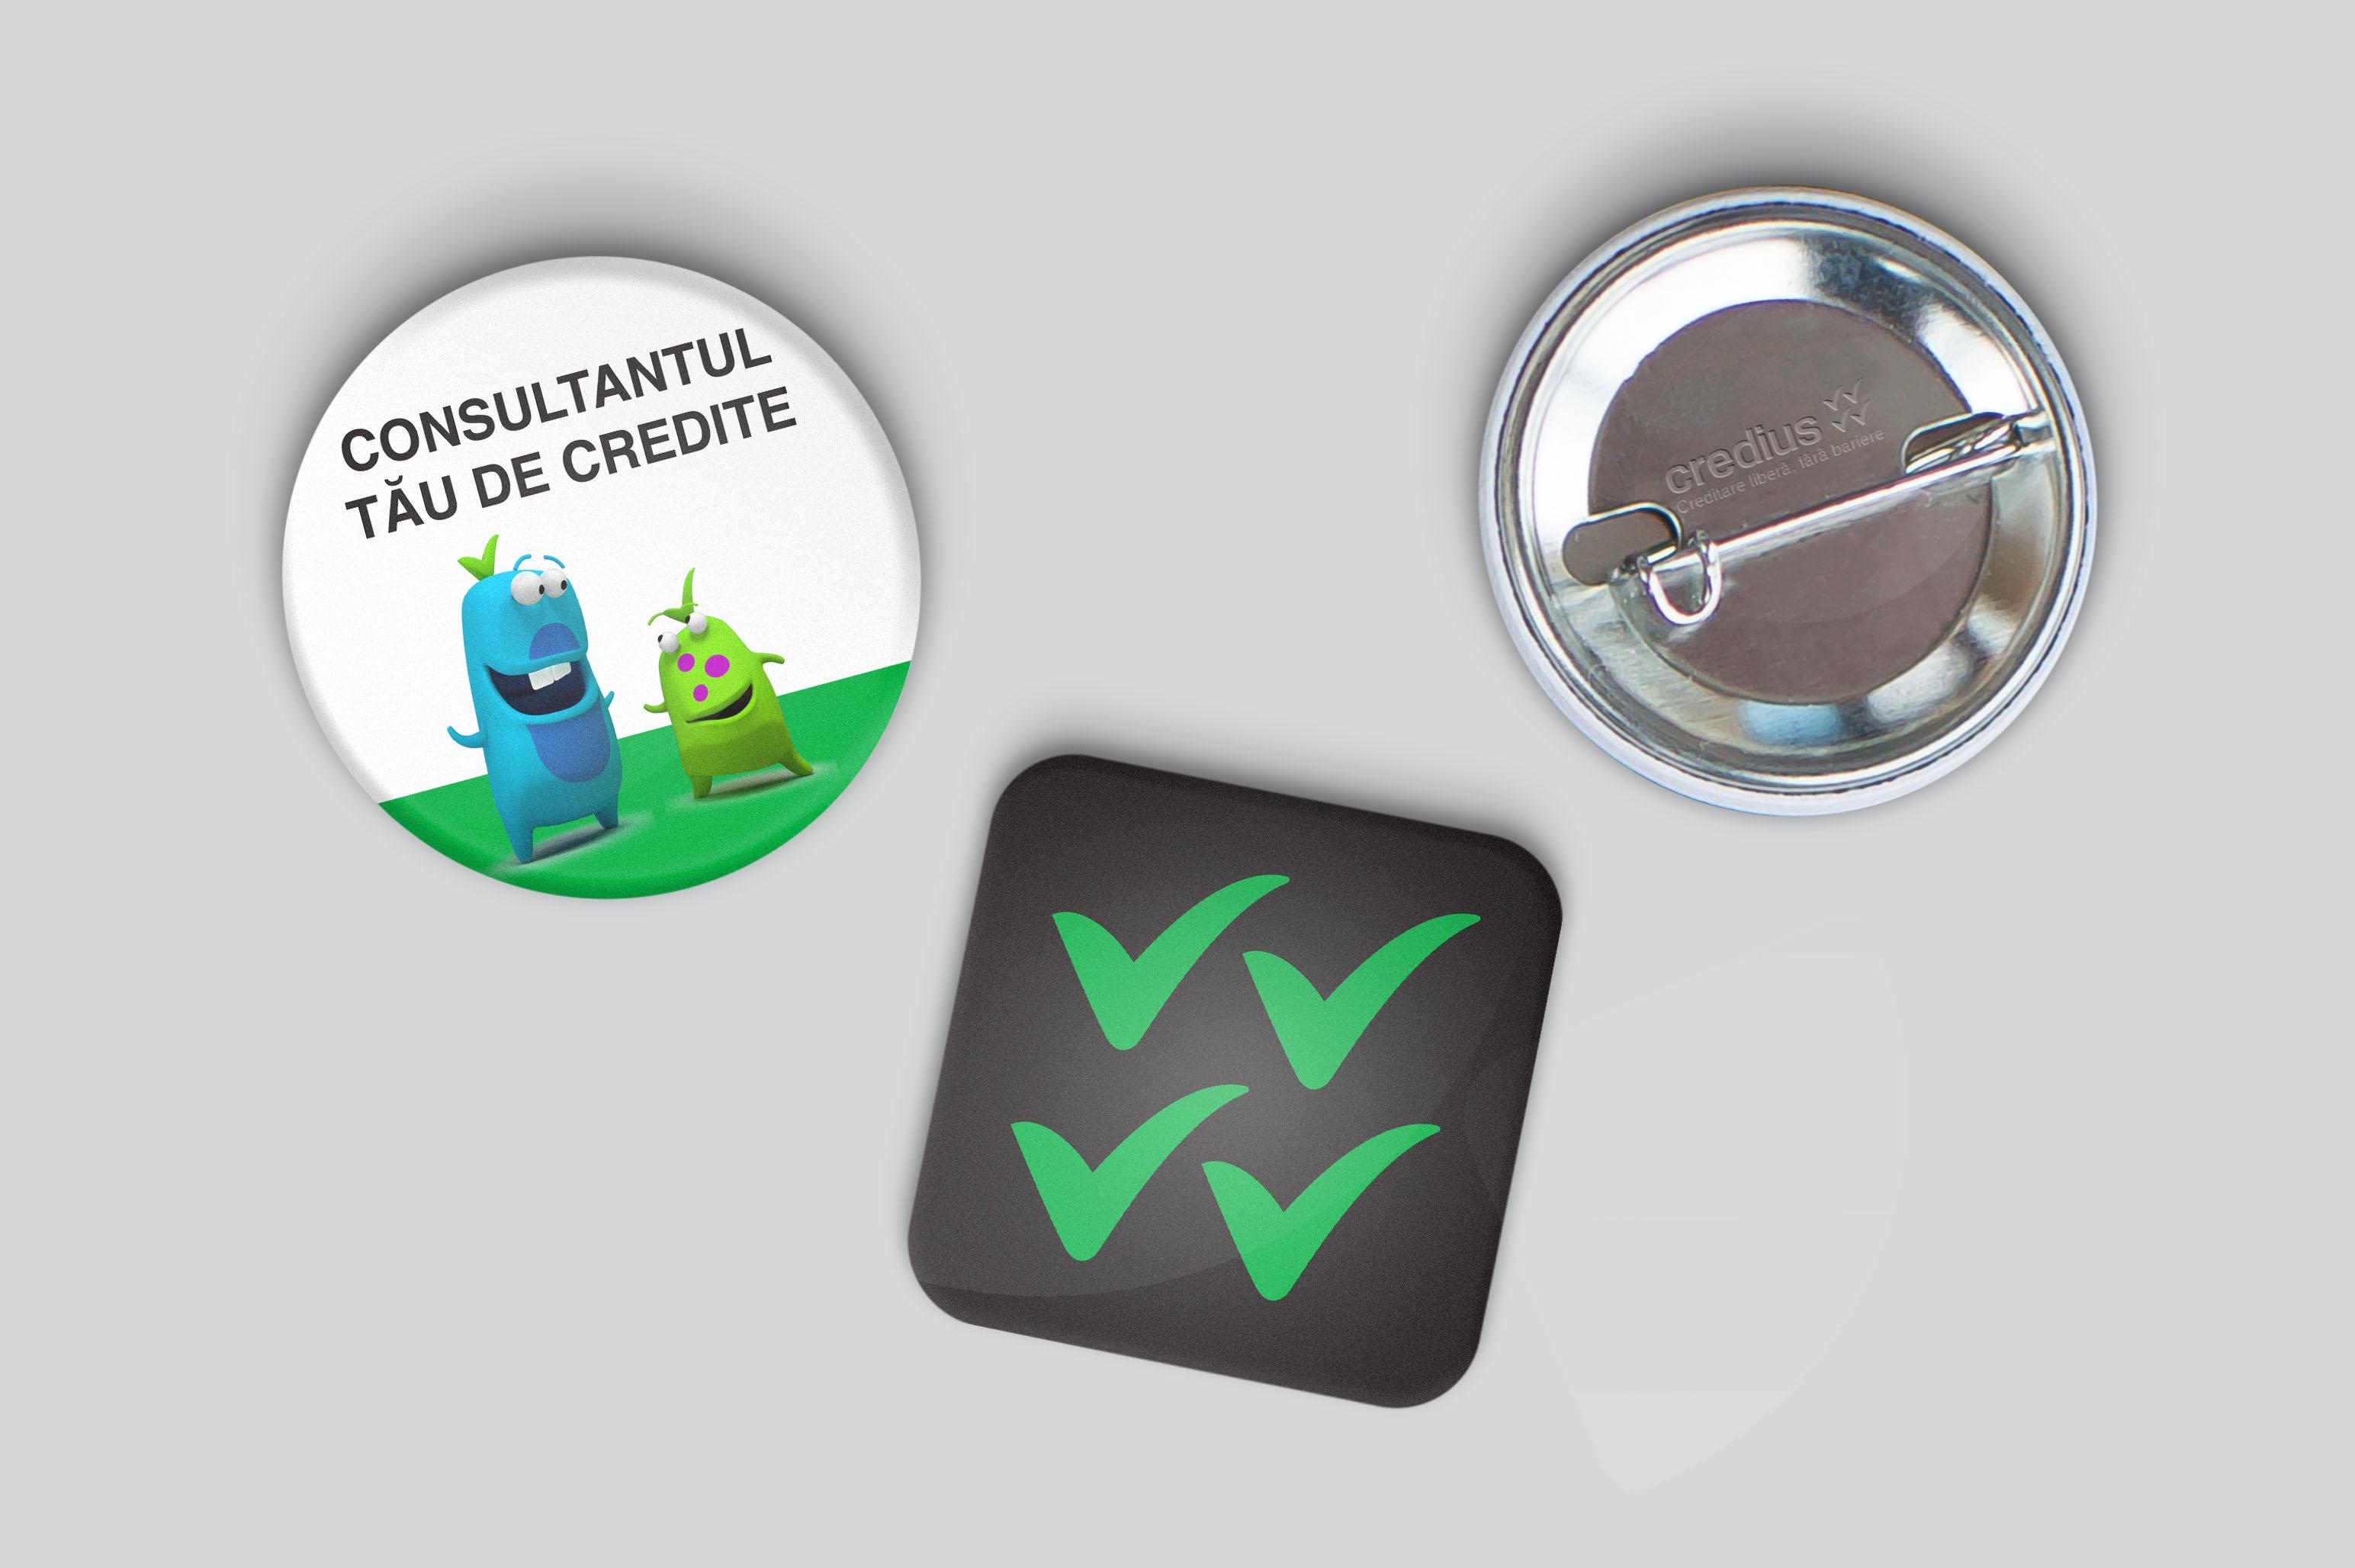 credius branding badges